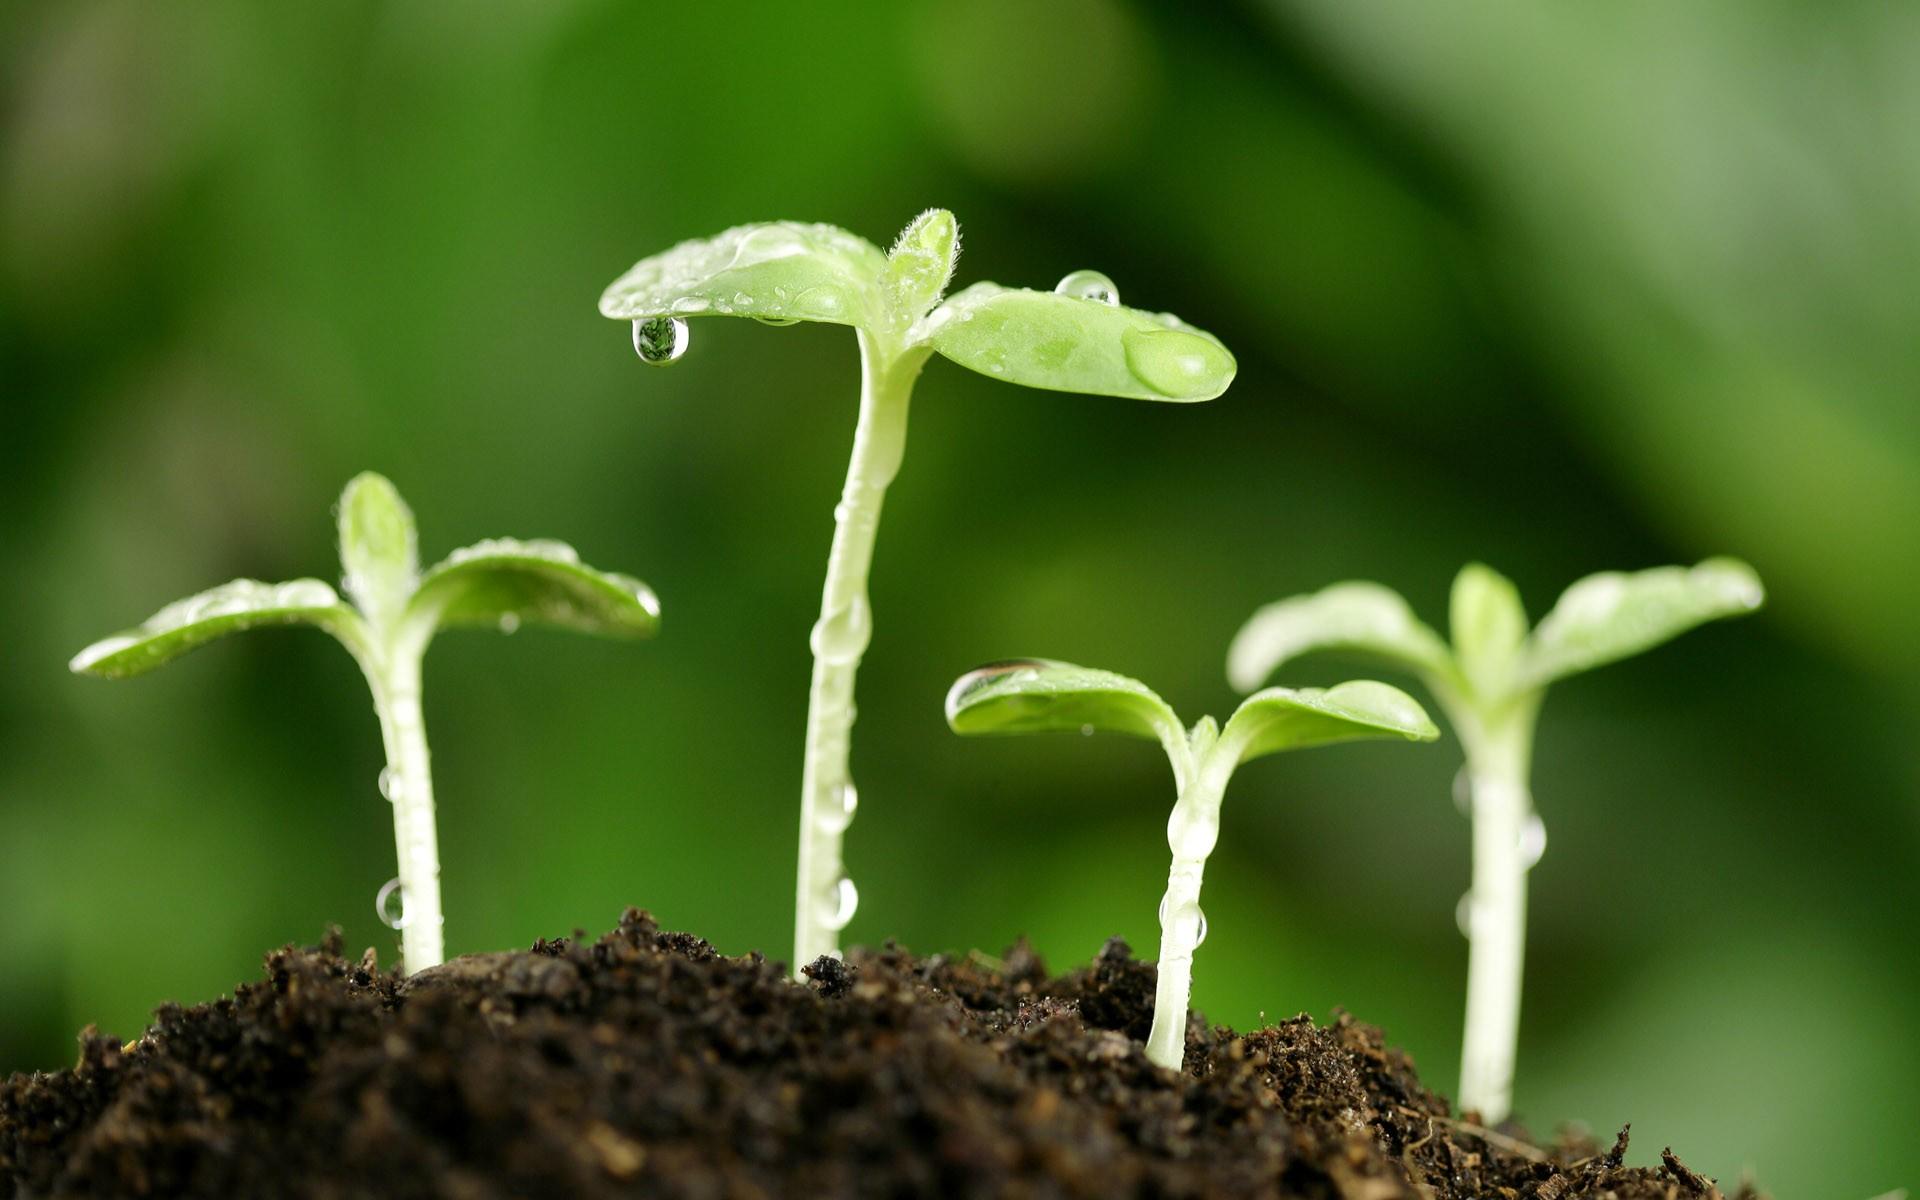 Hd 5 1920x1200 hd for Green pflanzen